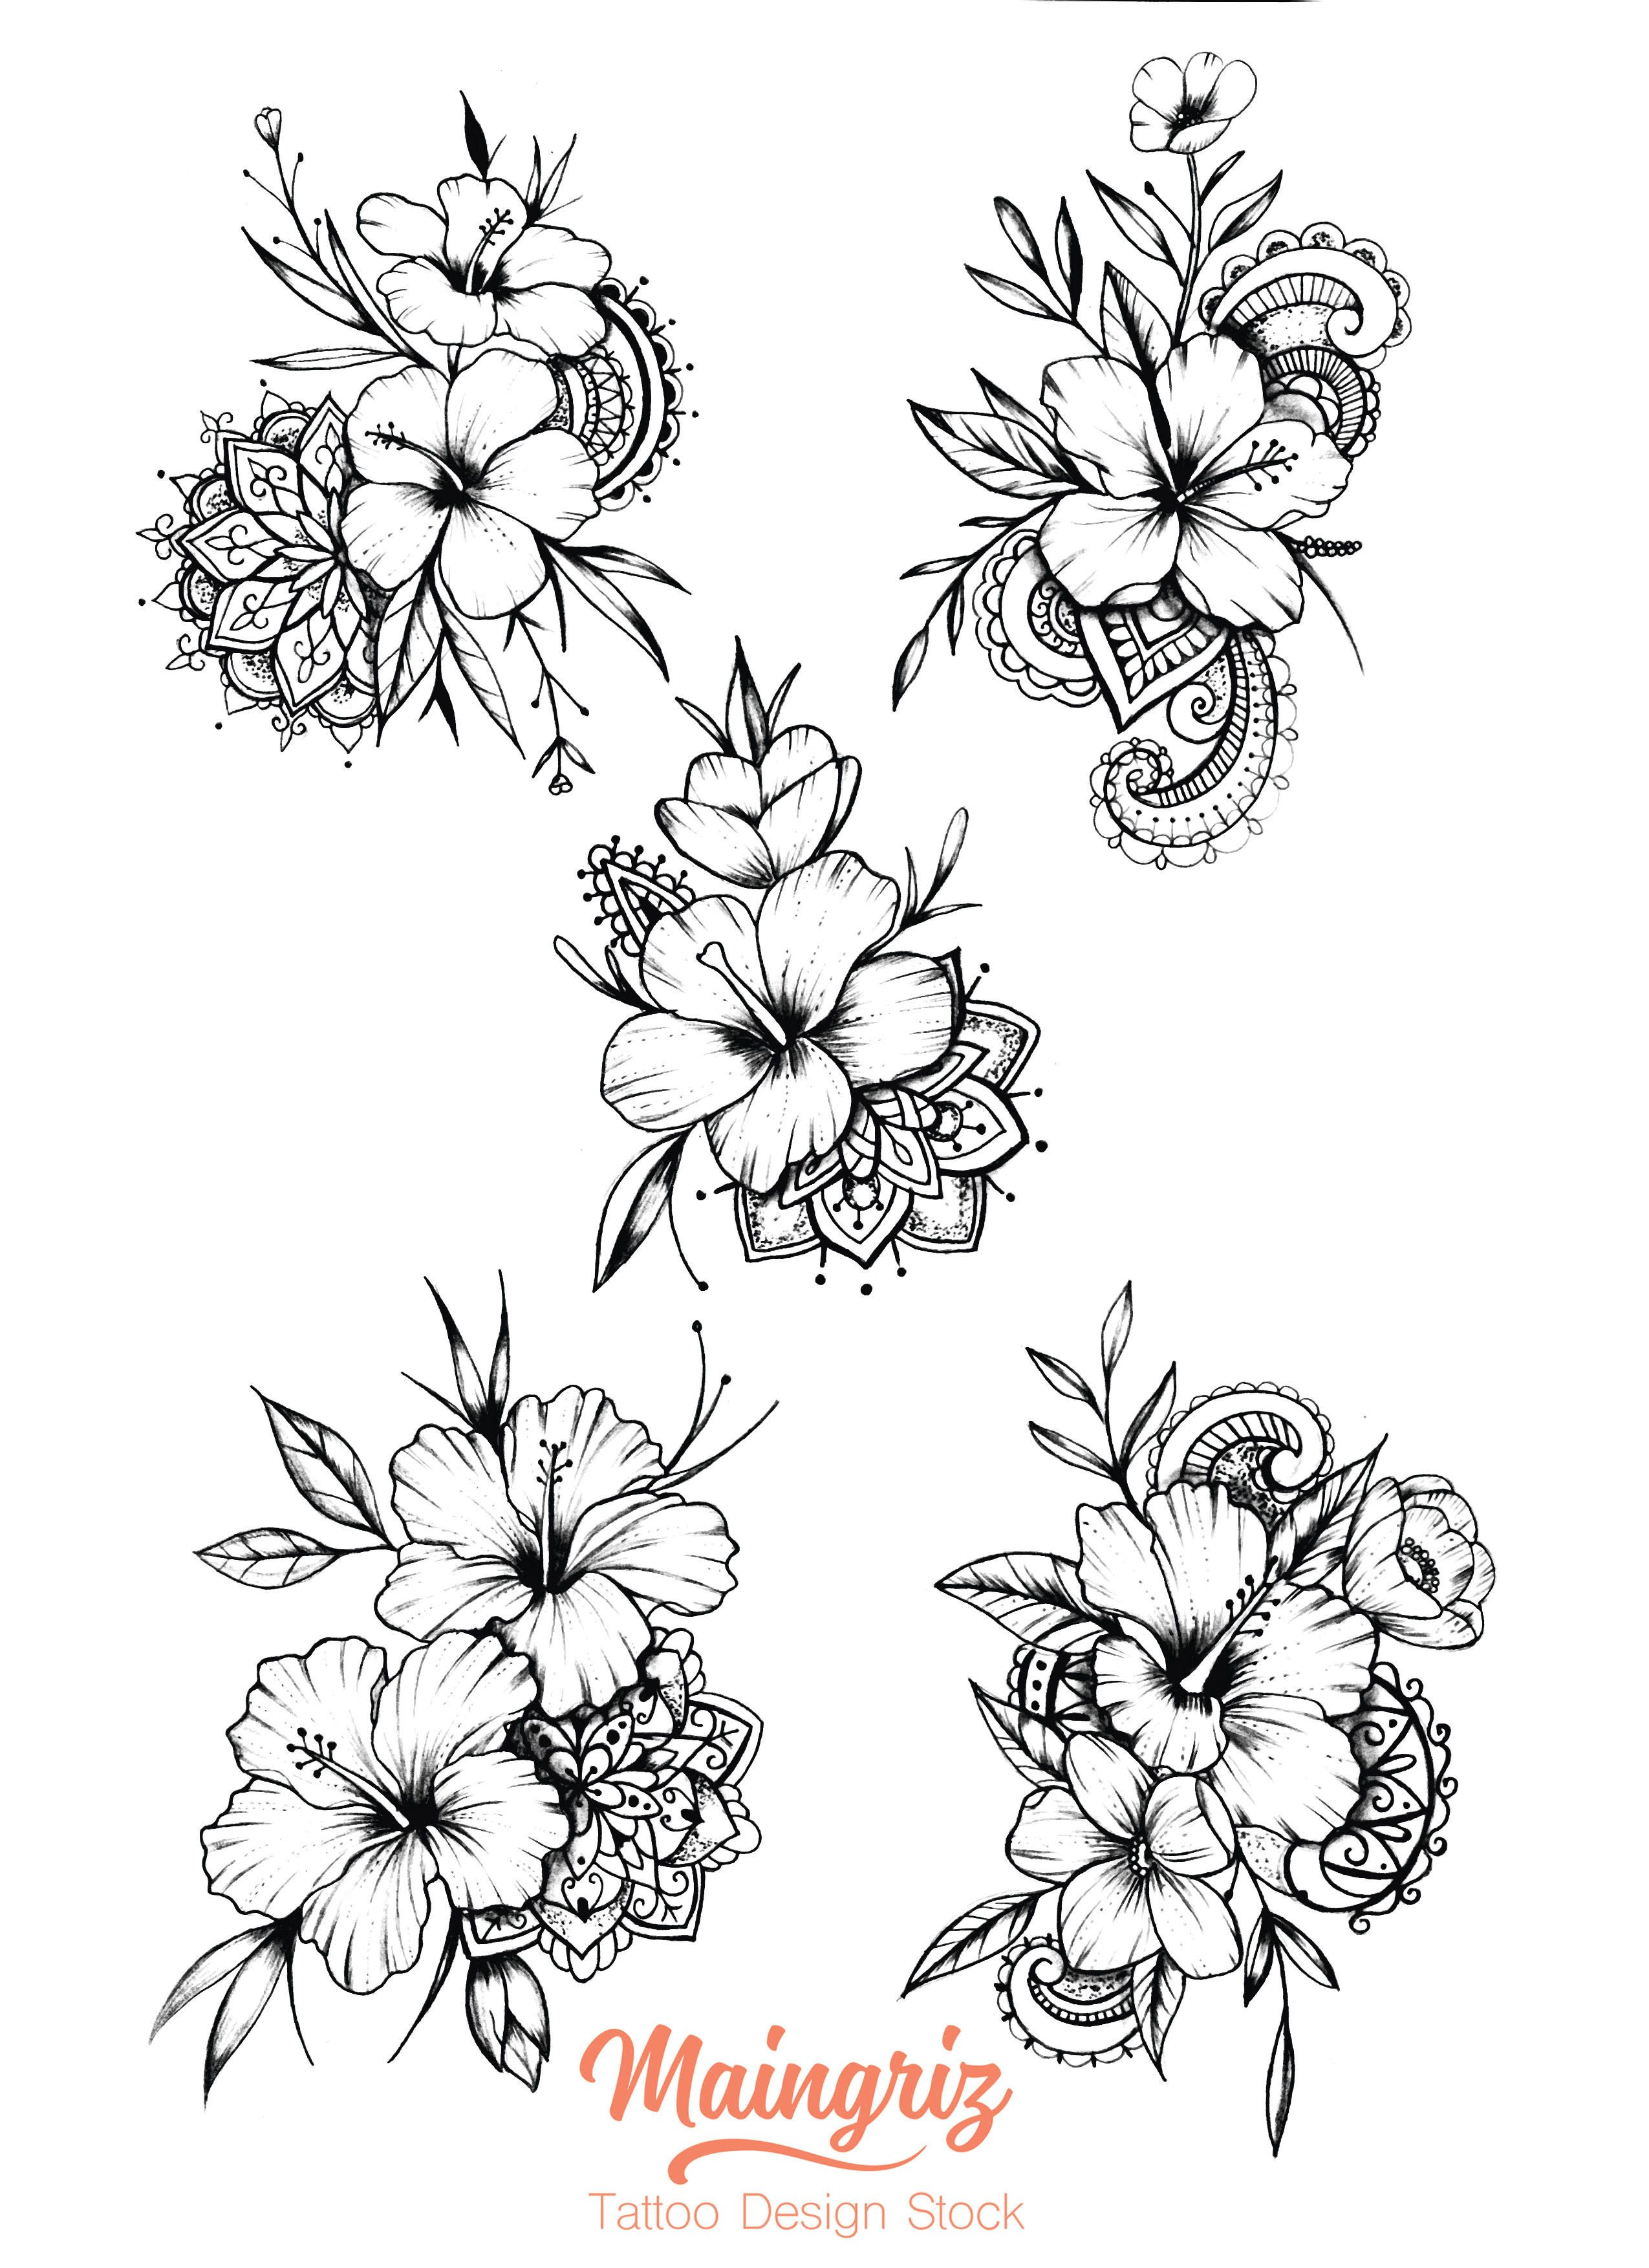 Demander un prix | Maingriz Tattoo Design